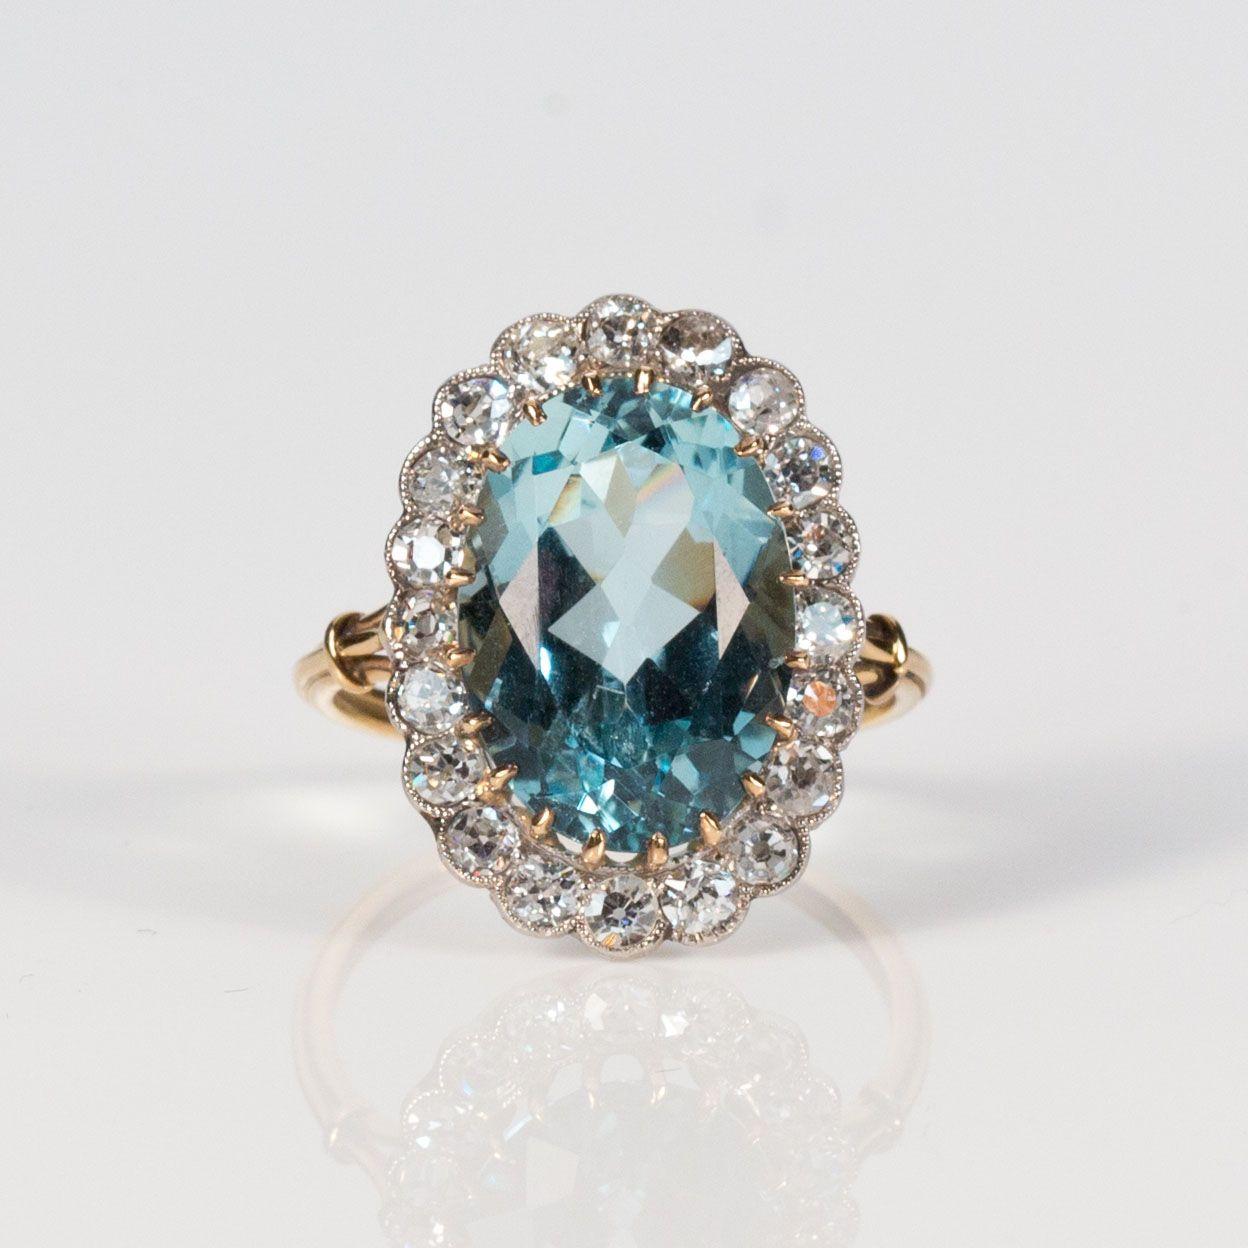 Antique 18K Gold Aquamarine and Old Mine Cut Diamond Ring   Keils ...